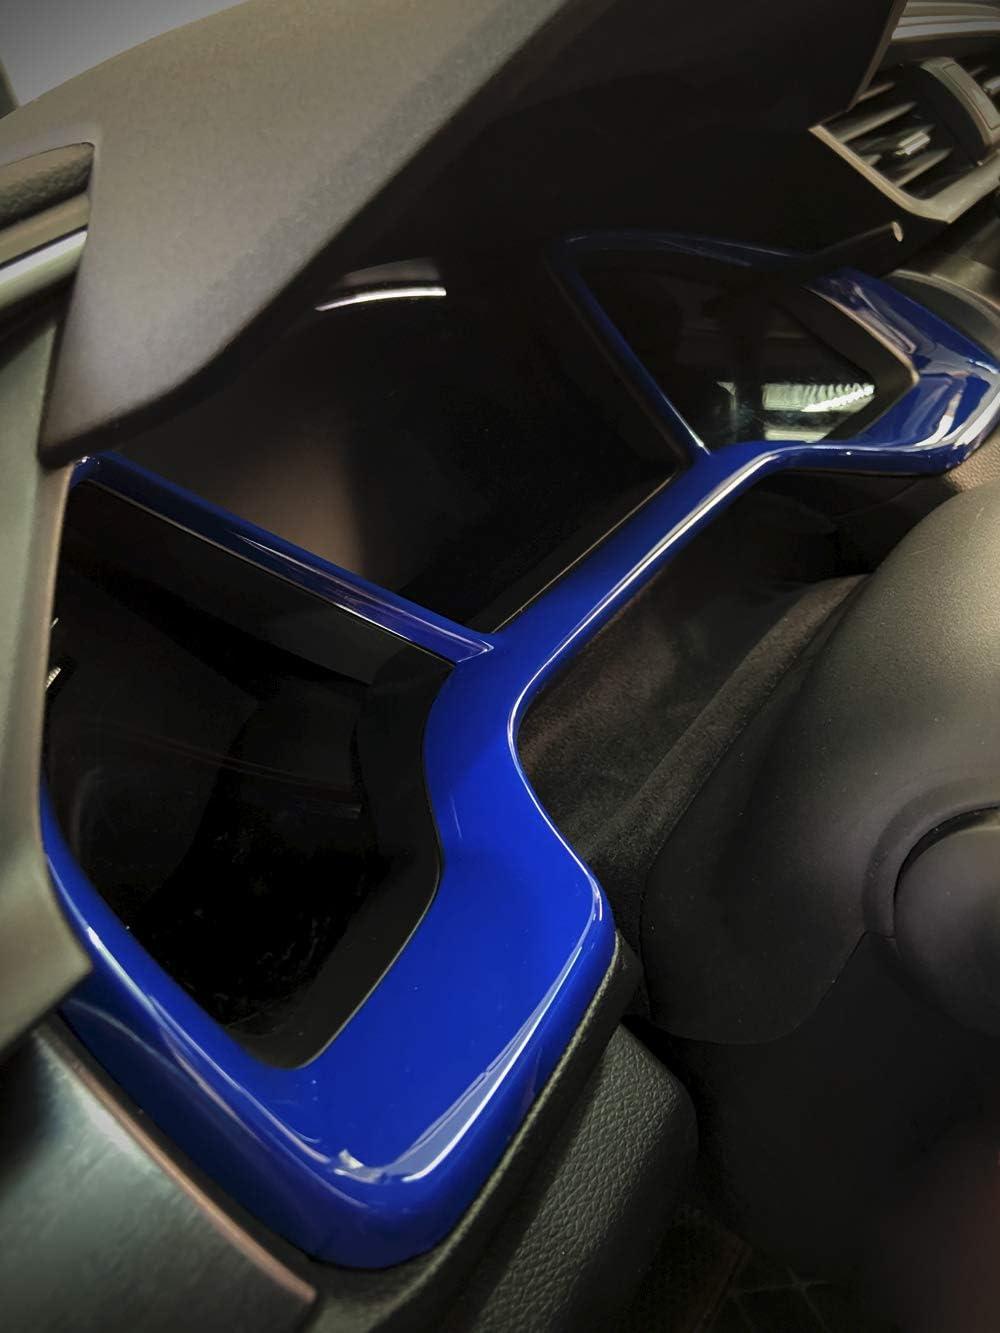 Blue Car Dashboard Decorative Frame Dial Rings Trim Frame For Honda 10th Gen Civic 2016 2017 2018 2019 2020